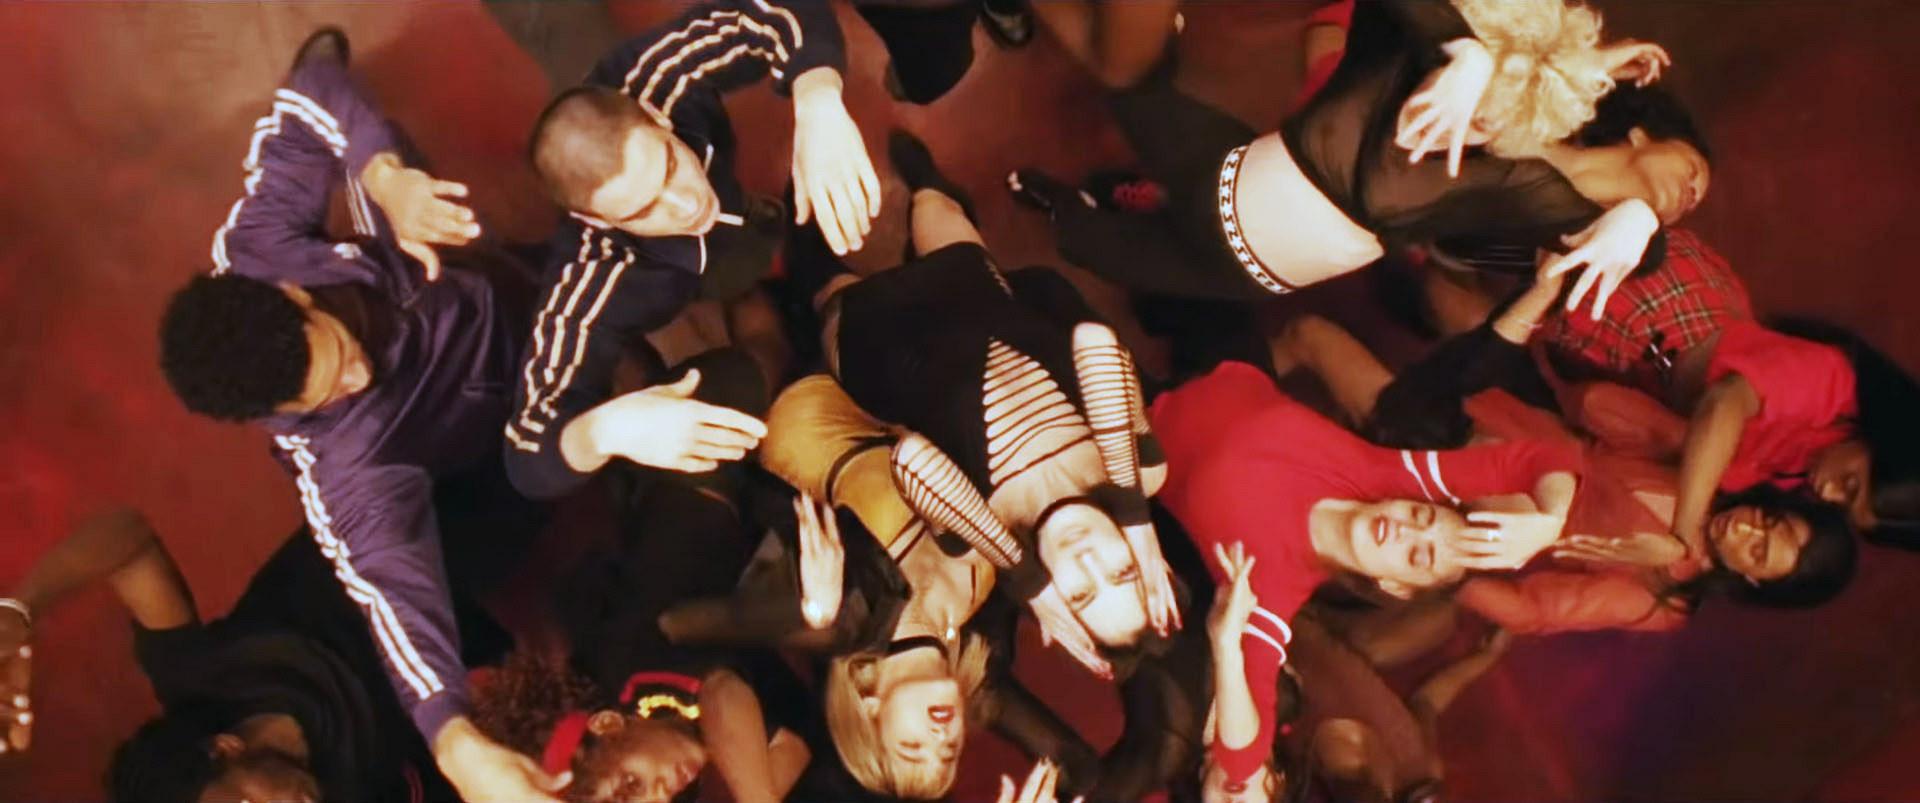 Romain Guillermic, Sharleen Temple, Gizelle Palmer, Sarah Bella, Lea Vlamos, and Sofia Boutella all dance in a circle